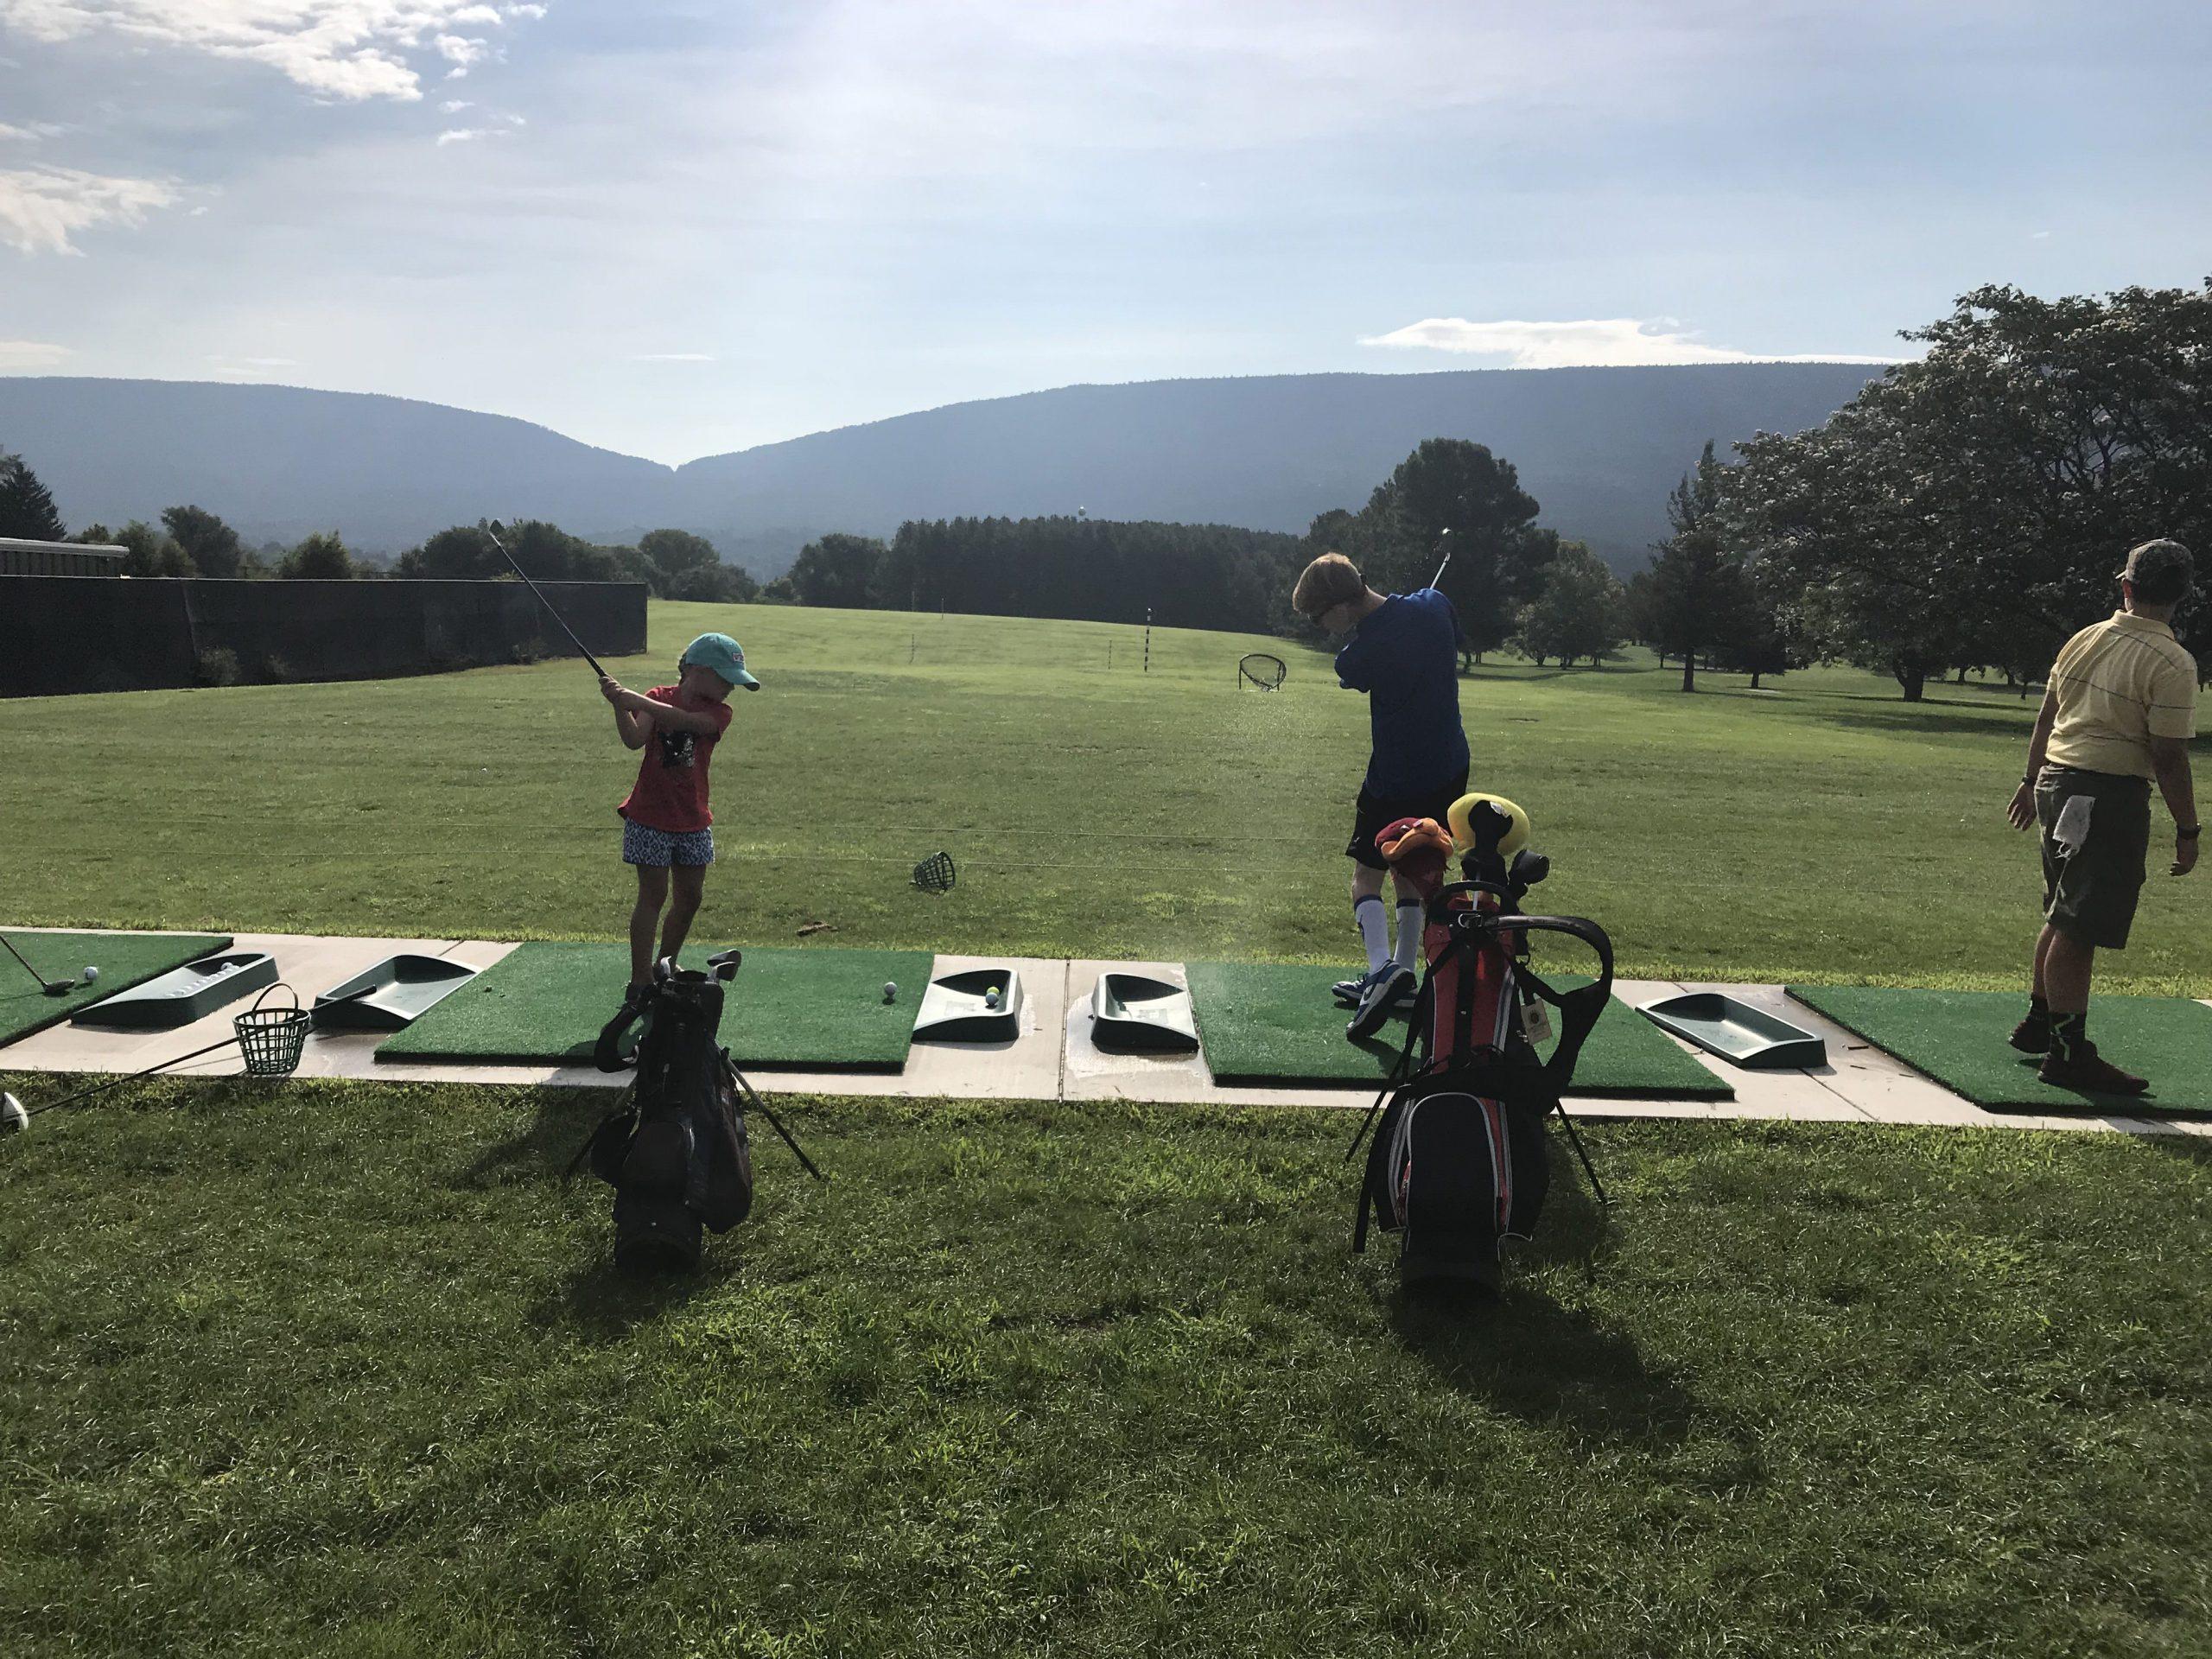 Junior golfers on the driving range